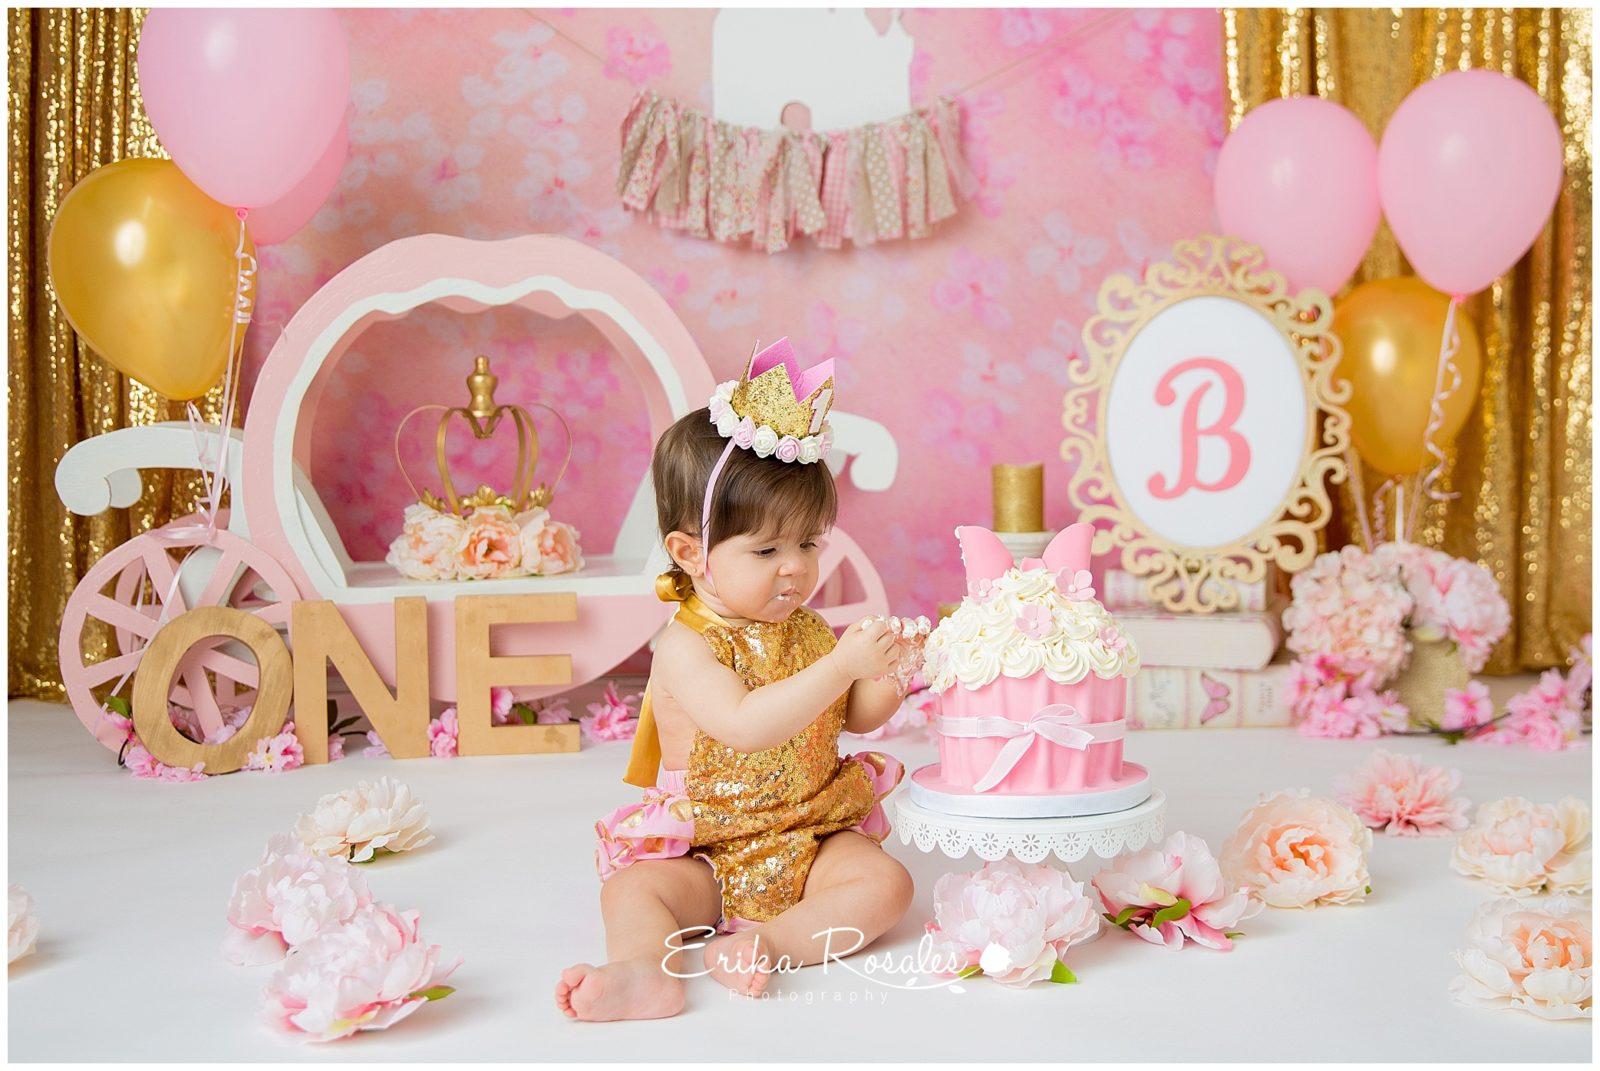 Cake Smash Princess Photo Session - The Bronx Studio | Erika